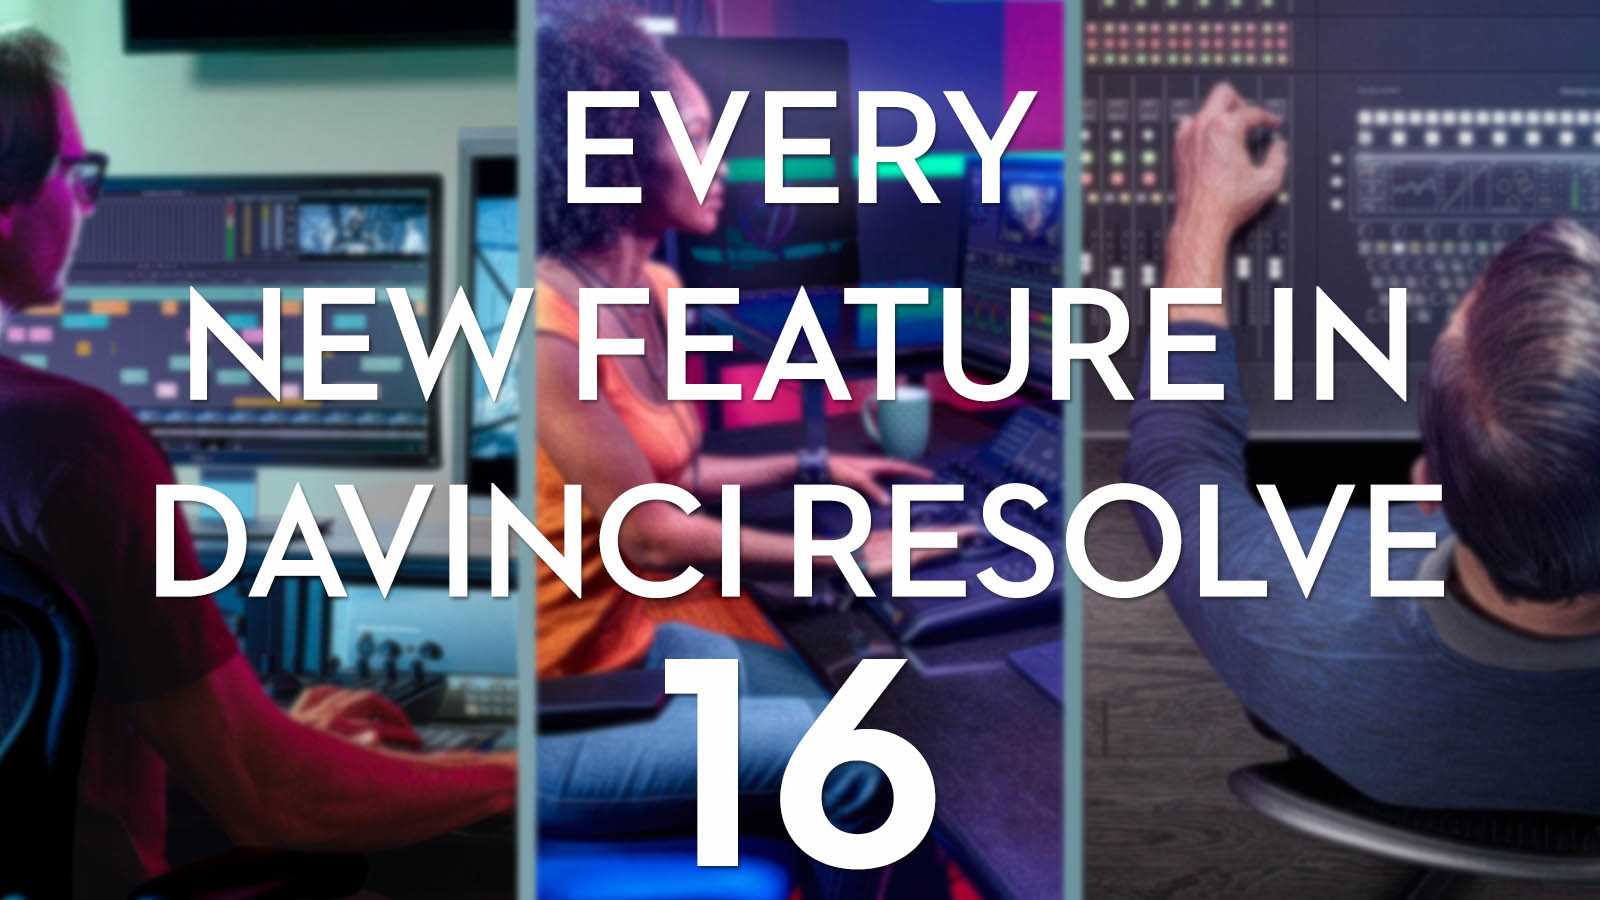 Understanding the new features in DaVinci Resolve 16 | Jonny Elwyn